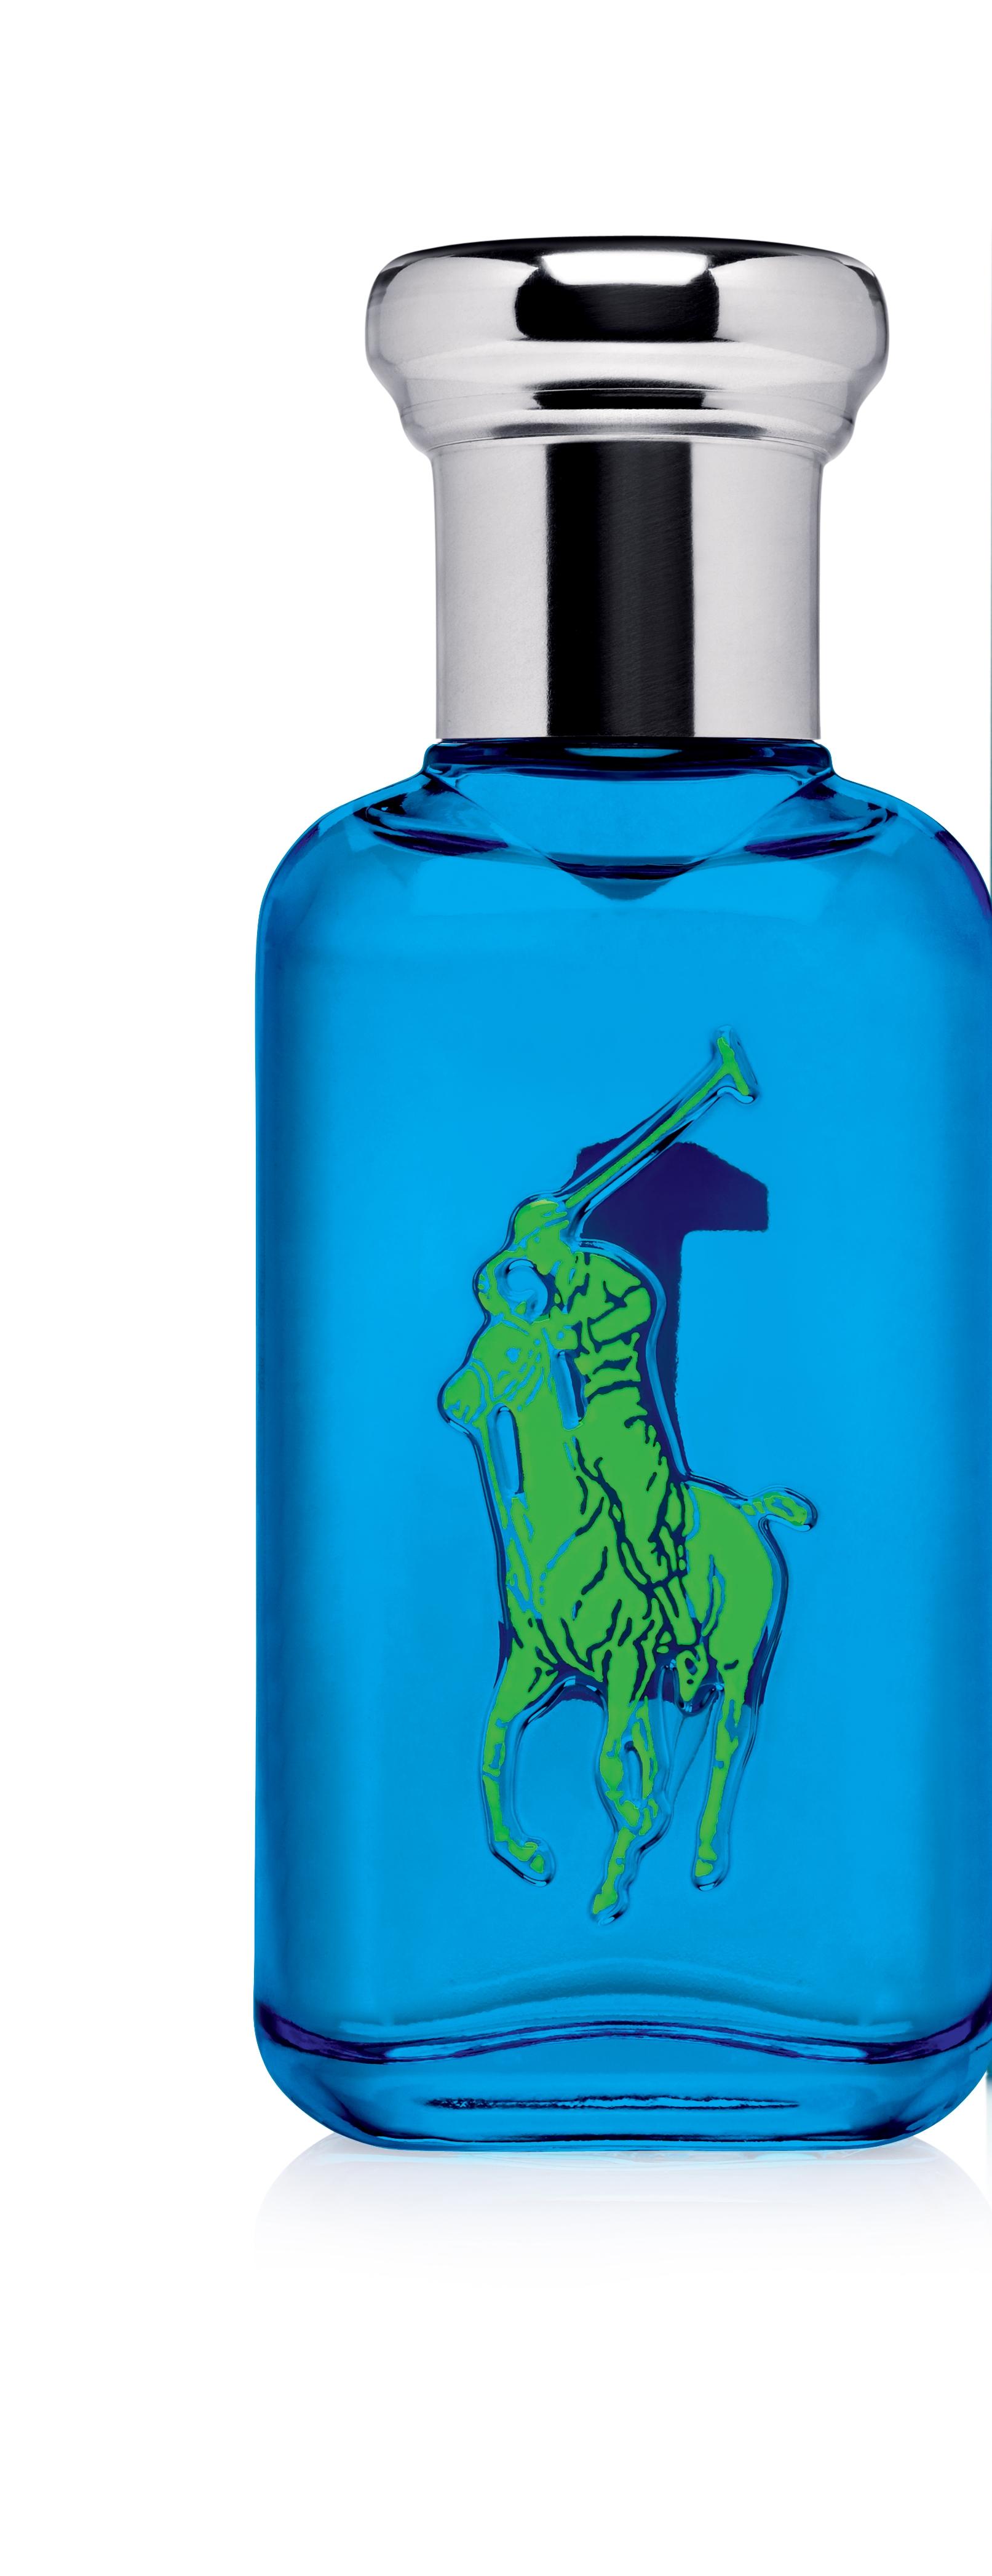 Ralph Lauren Big Pony 1 Blue Polo EDT, 50 ml